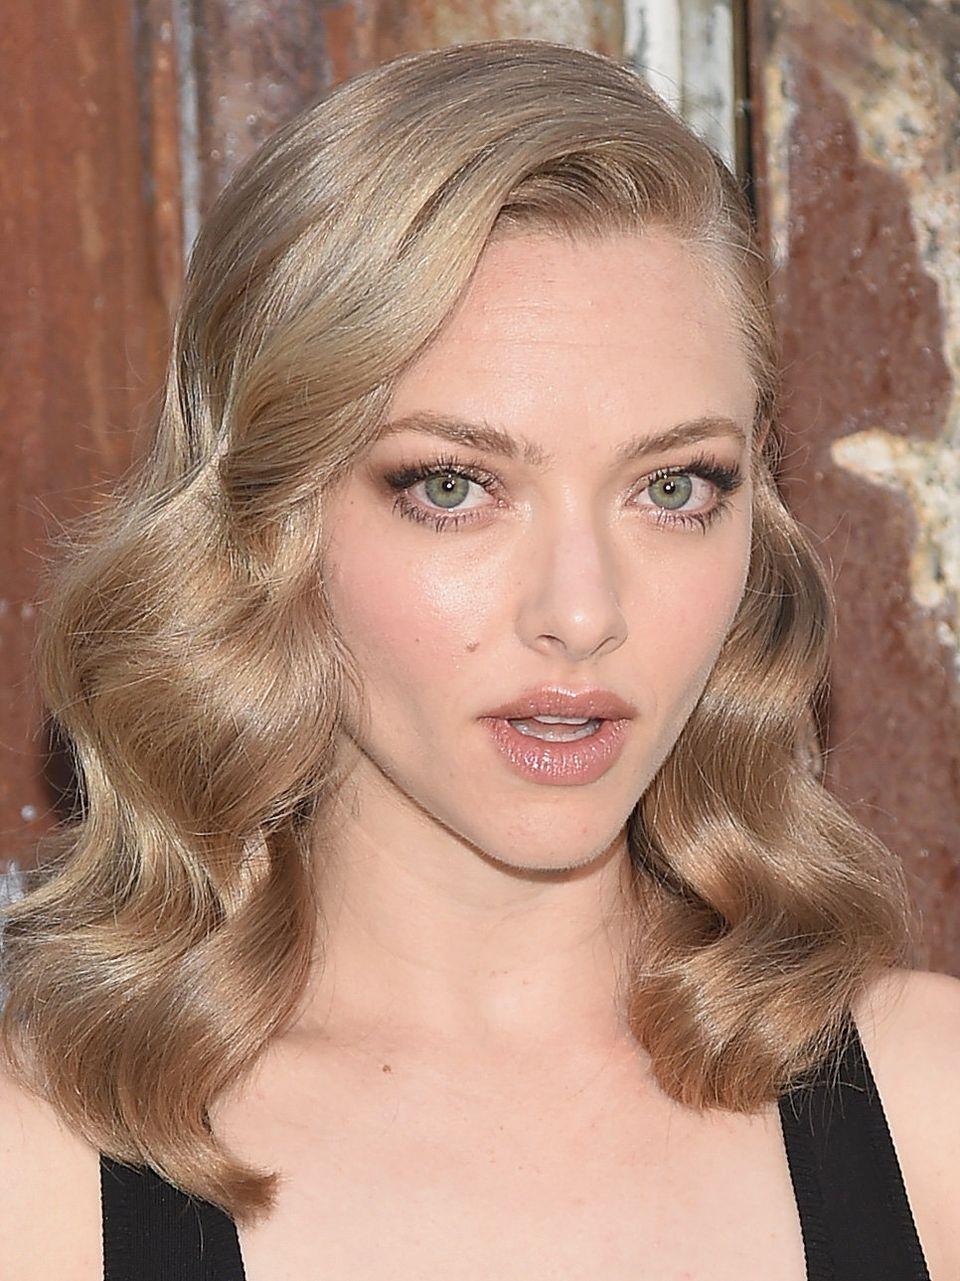 Berühmte blonde Filmstars, Weiße Muschi Teen Pornostars